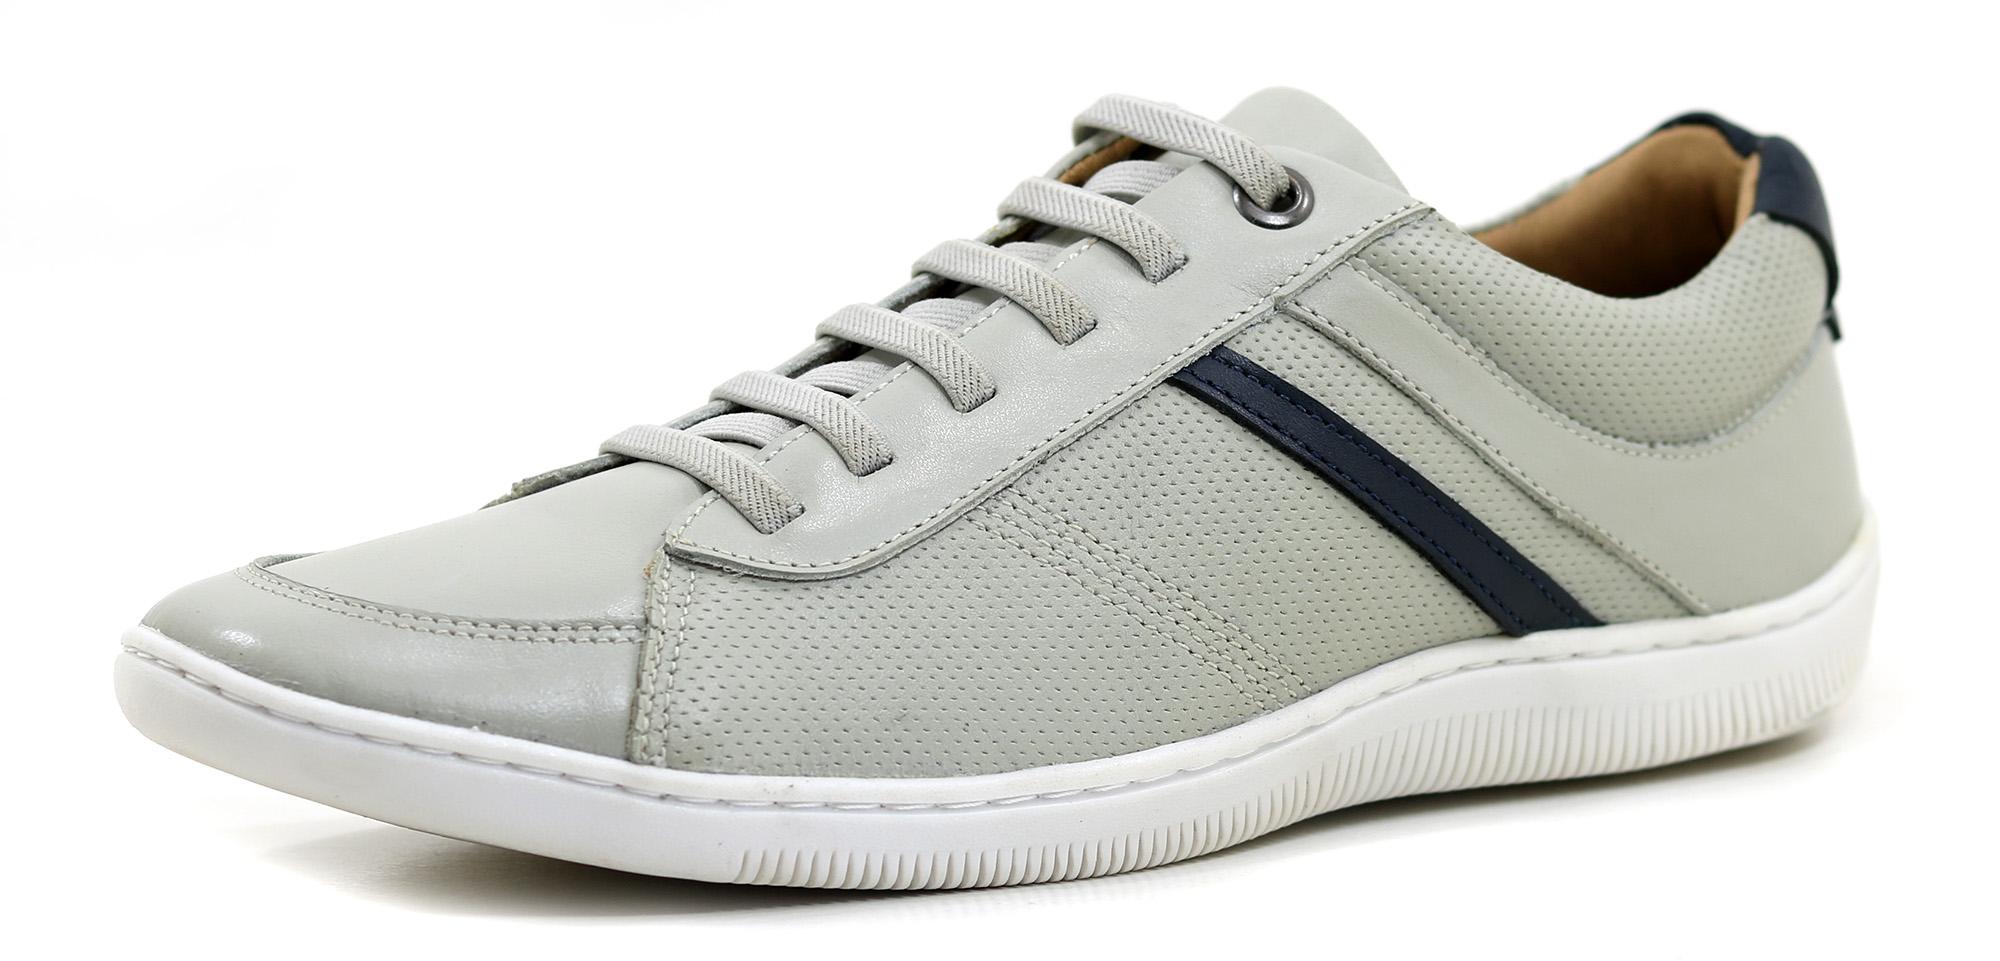 400f745978 Kit 2 pares Sapatenis Masculino Casual Orlandelli 05102 - Sapatos de ...